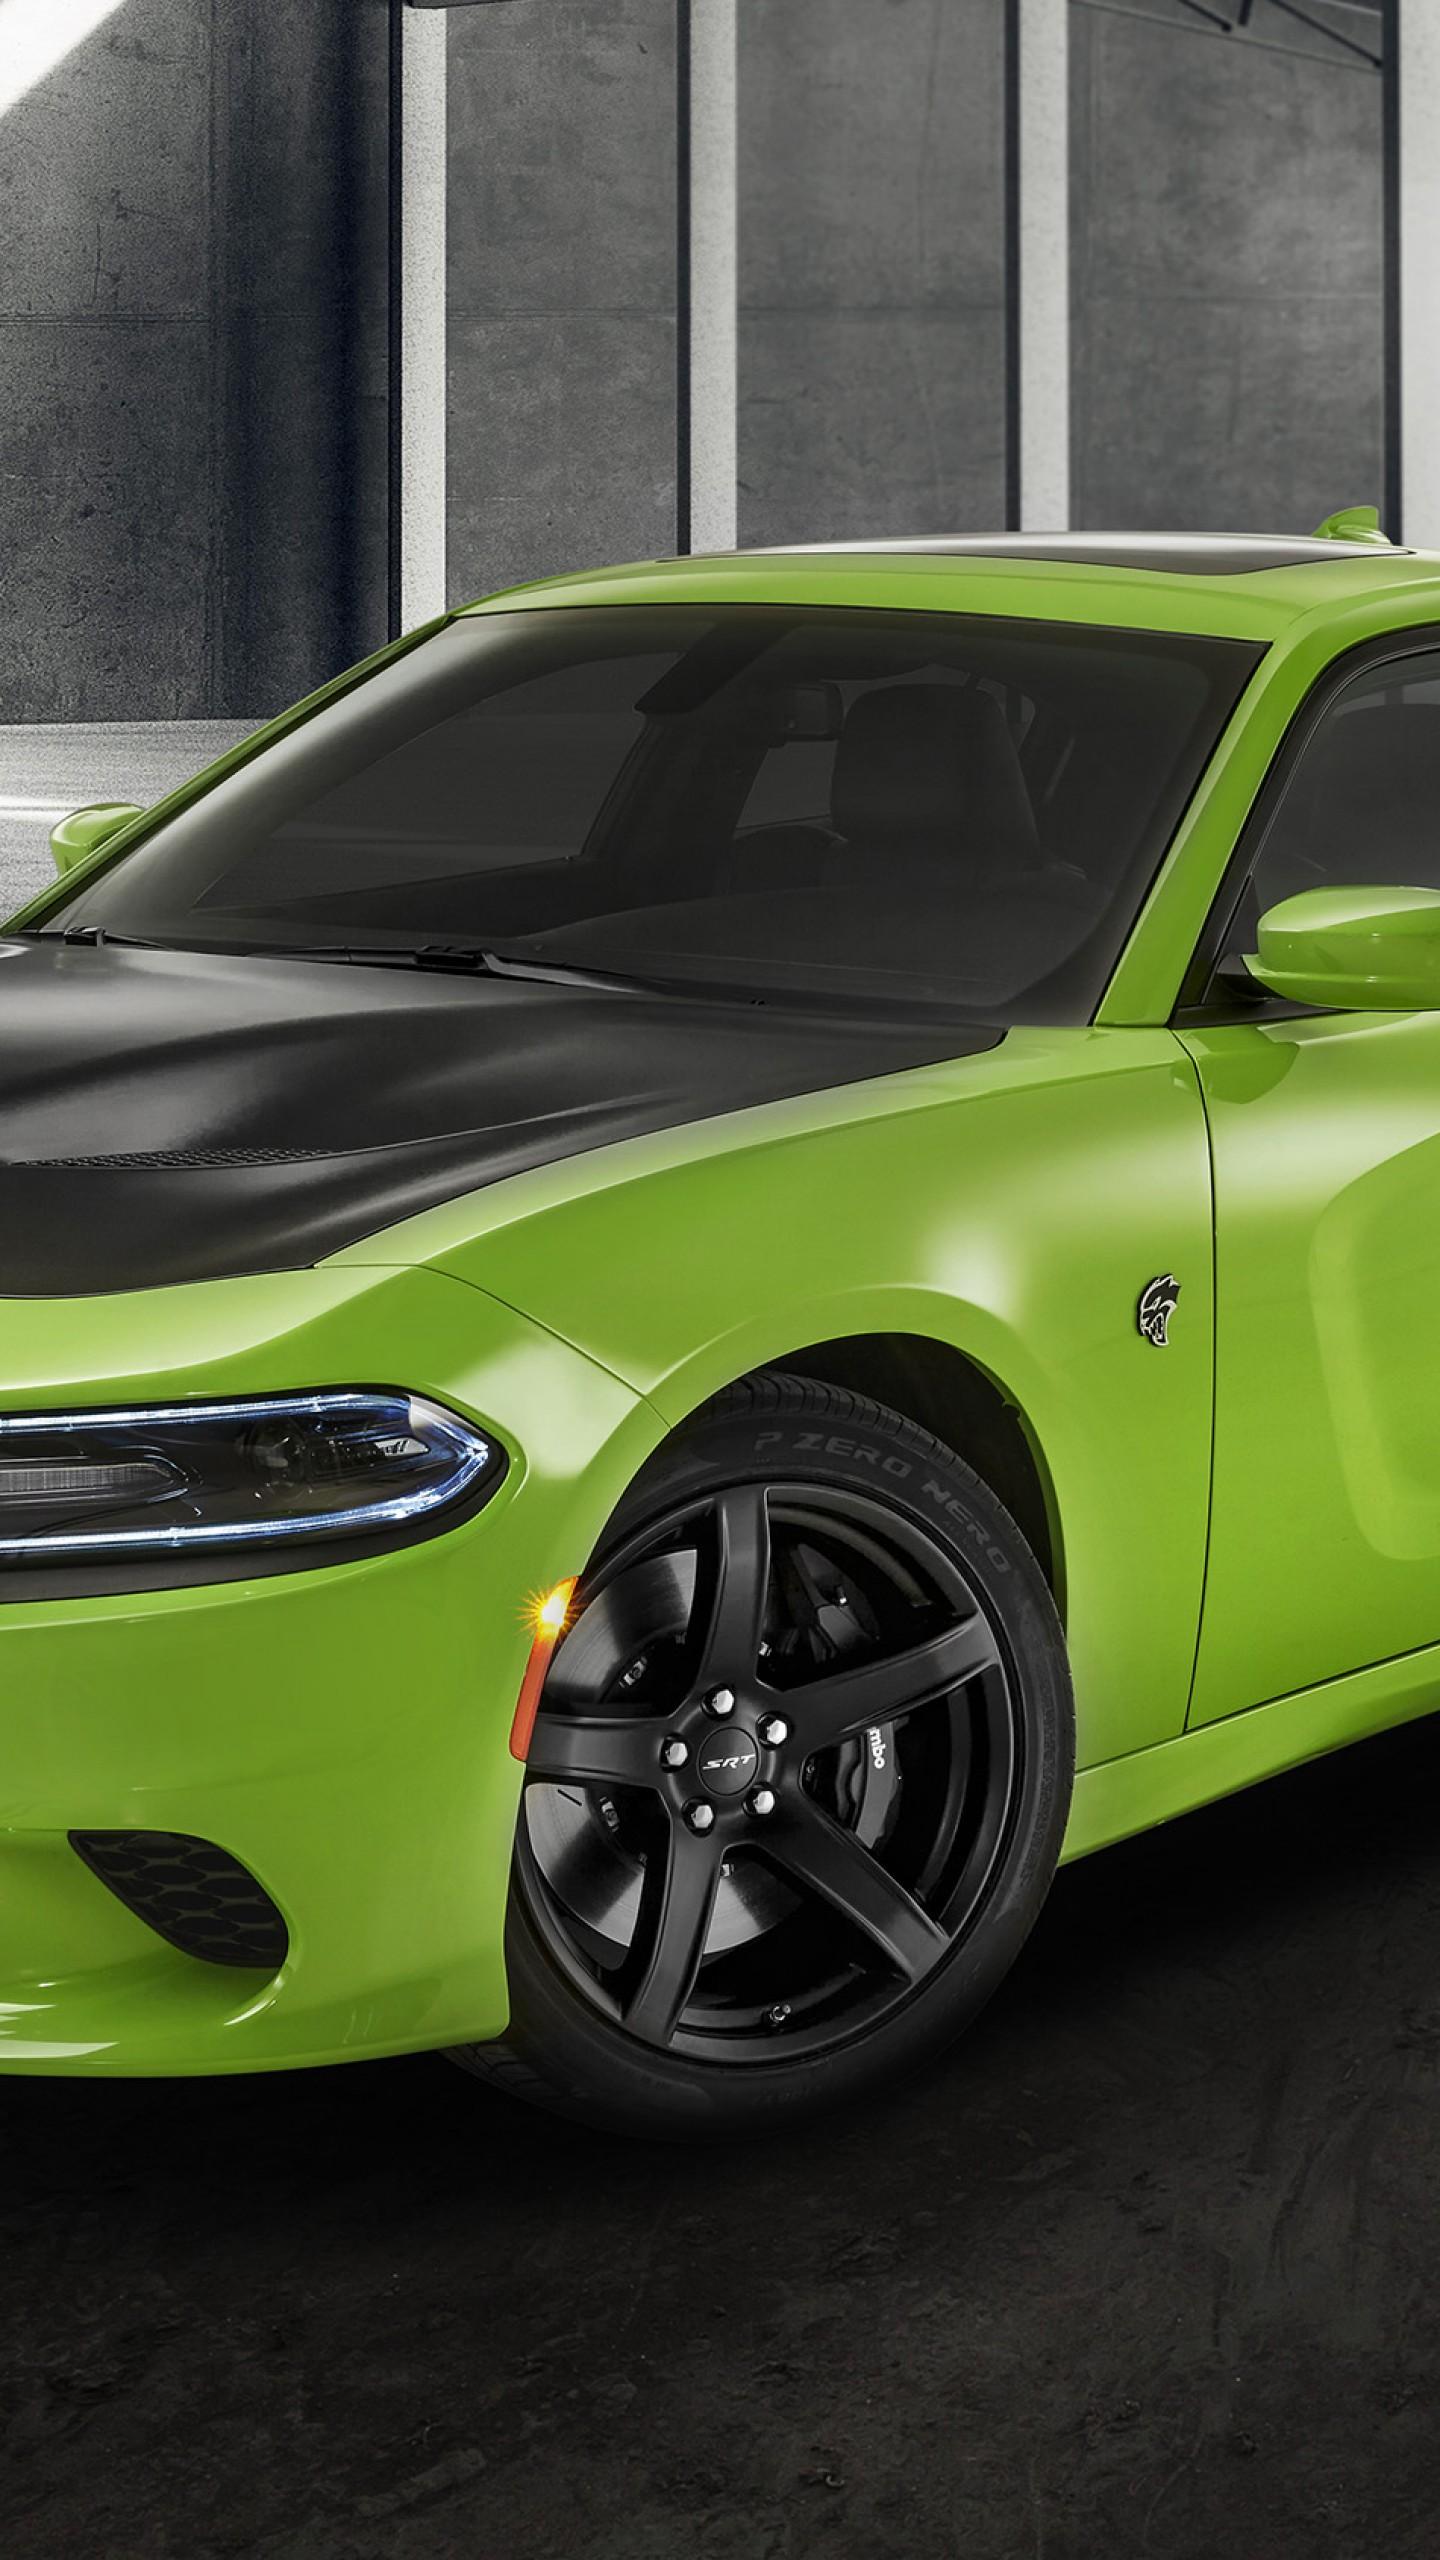 2020 Dodge Charger Green 1440x2560 Wallpaper Teahub Io